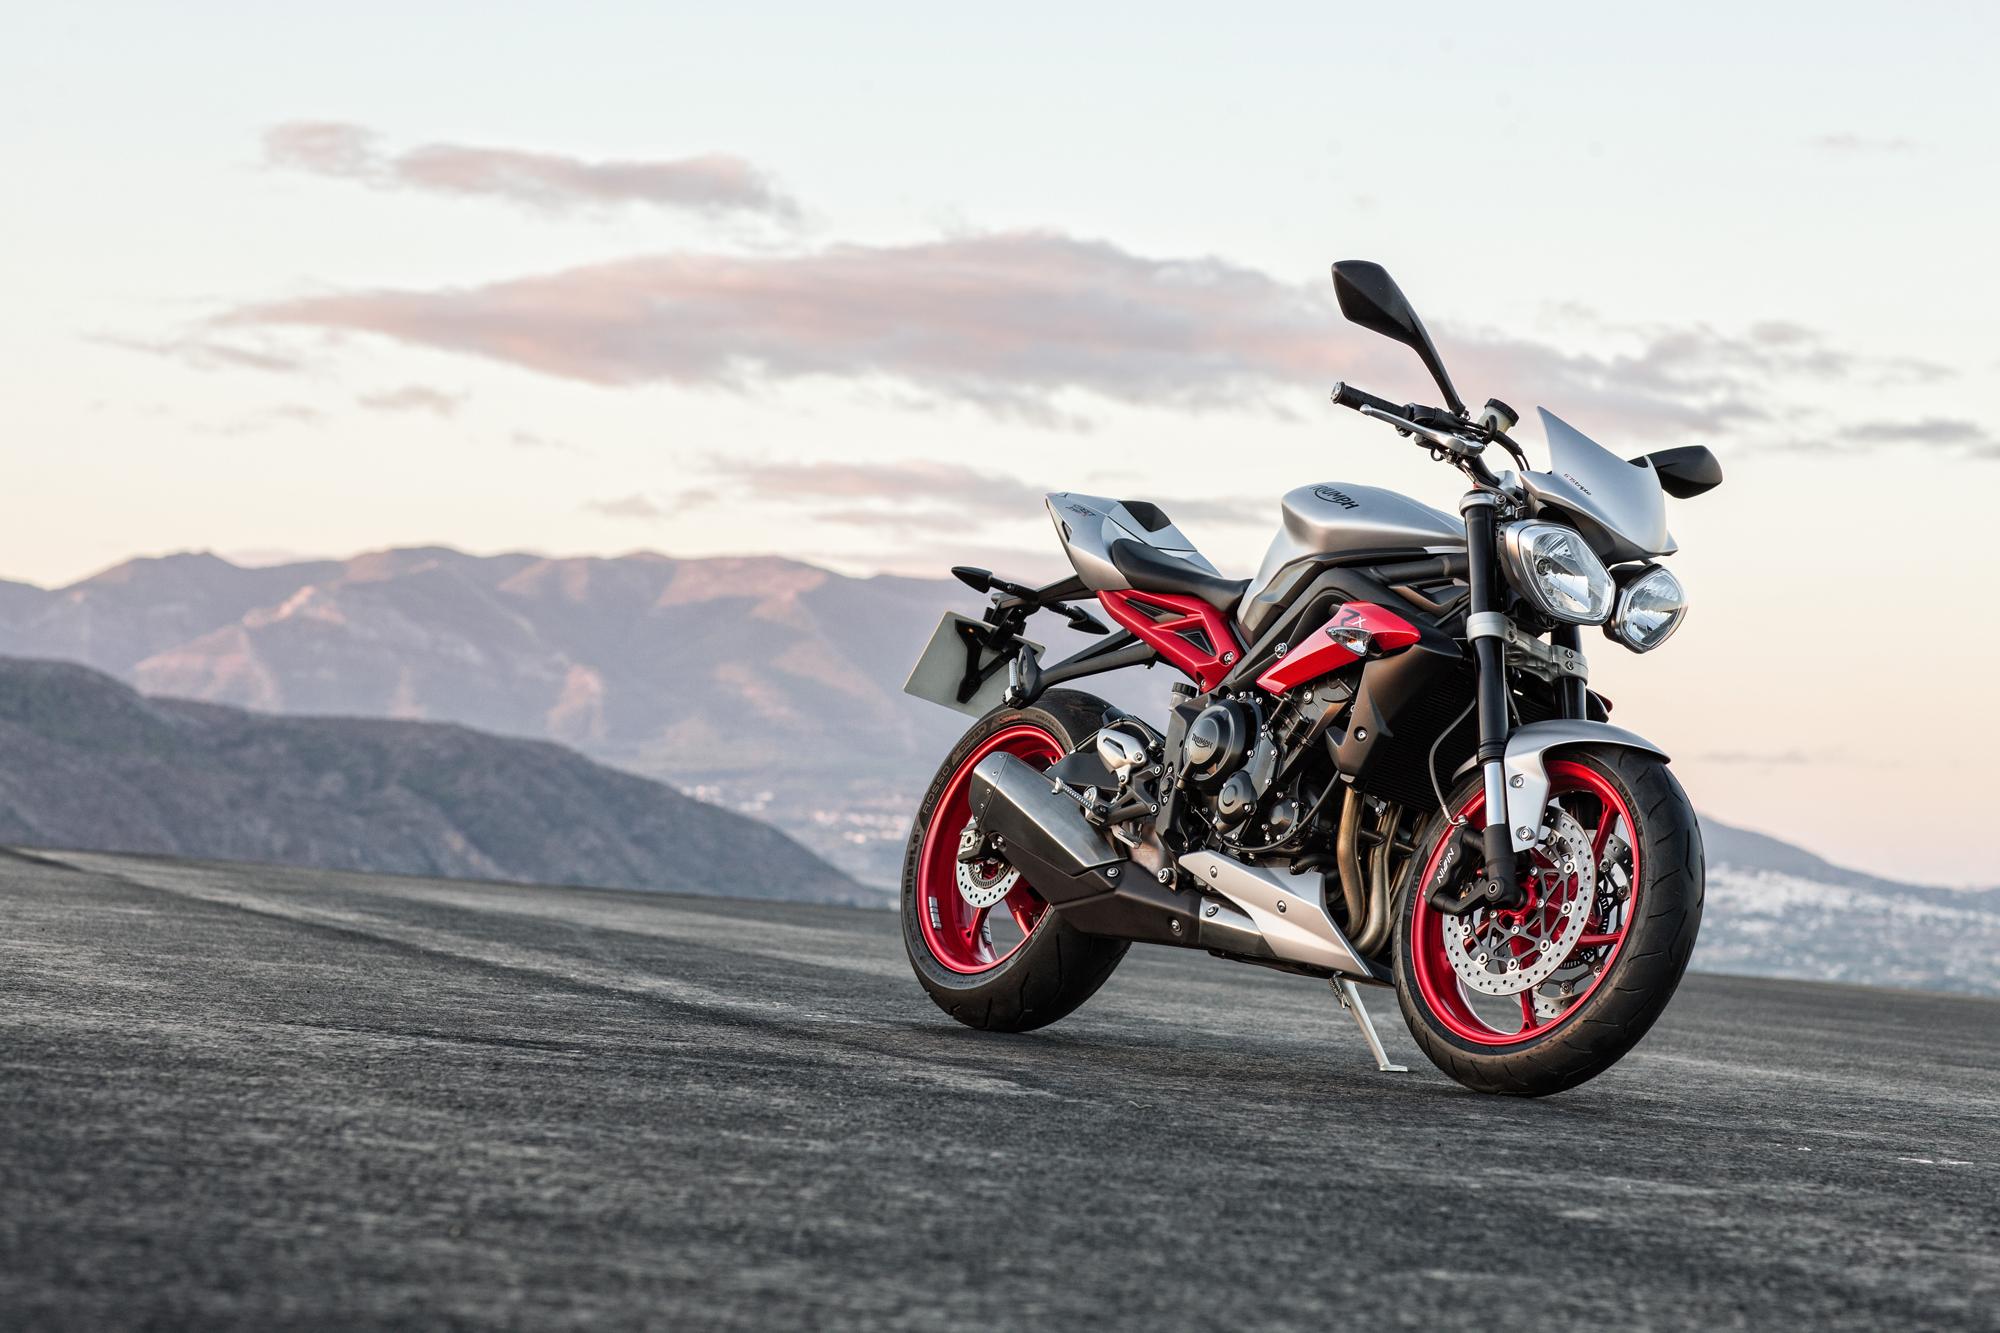 2017 Yamaha  YS125 motorcycle stationary